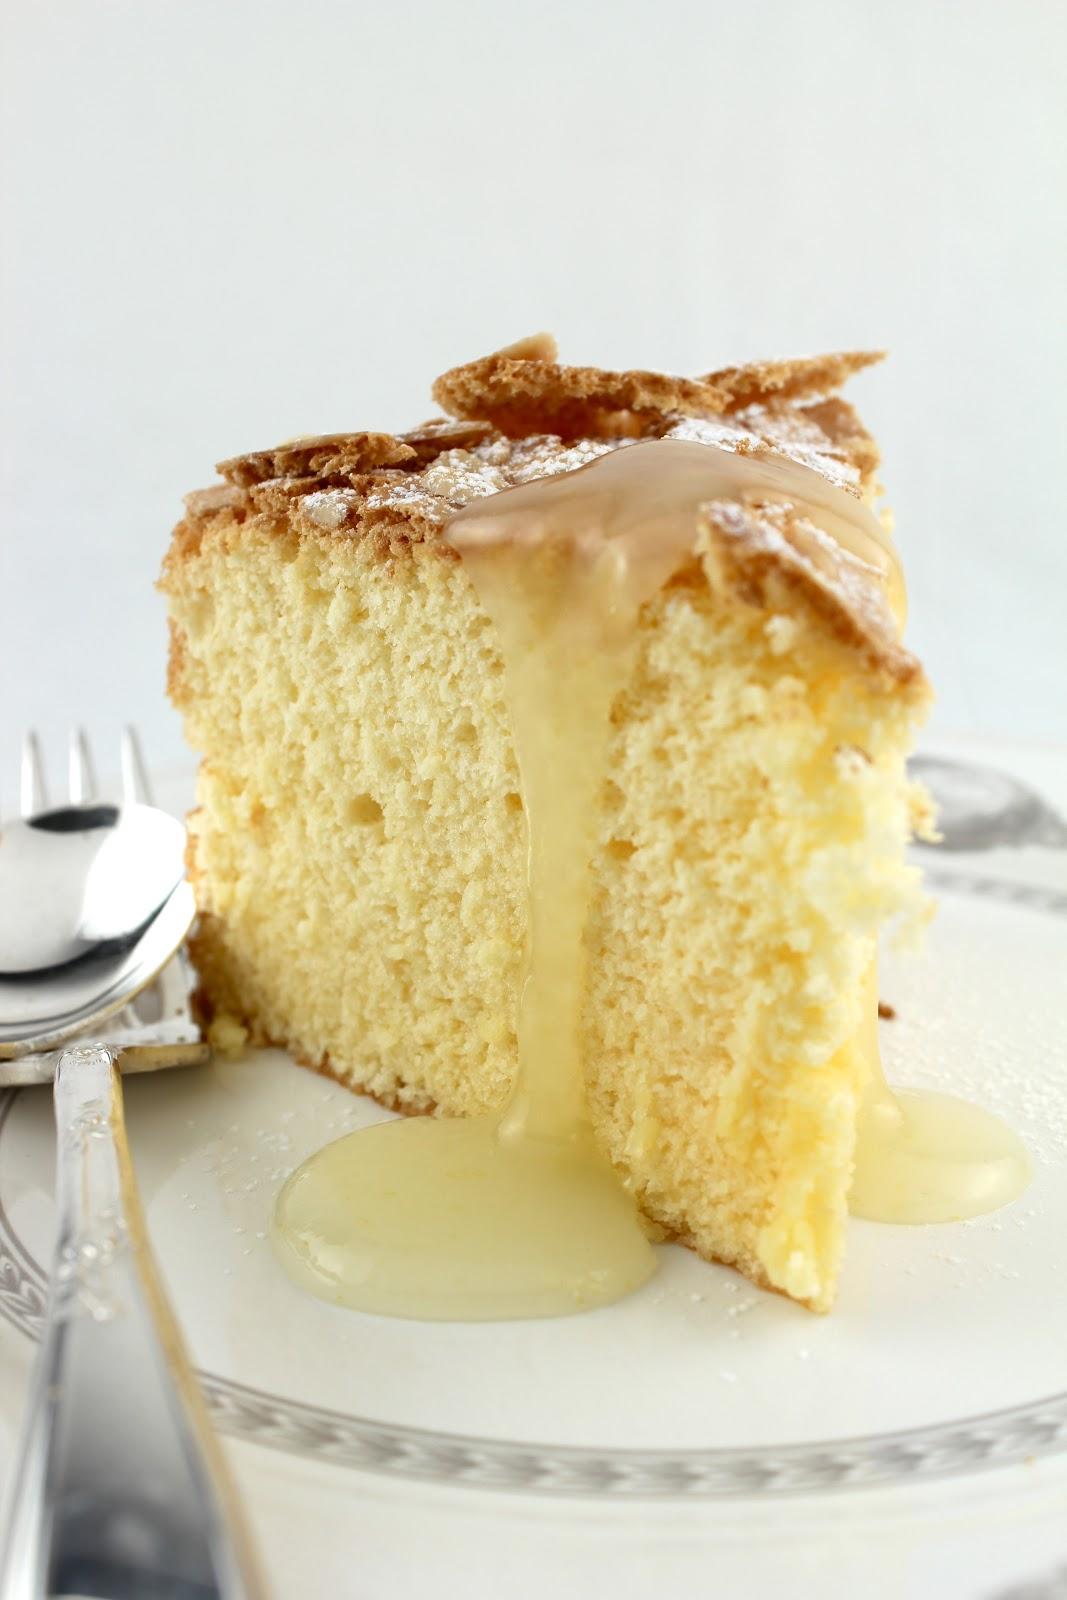 Passover Lemon Almond Sponge Cake with Warm Lemon Sauce | Entries ...